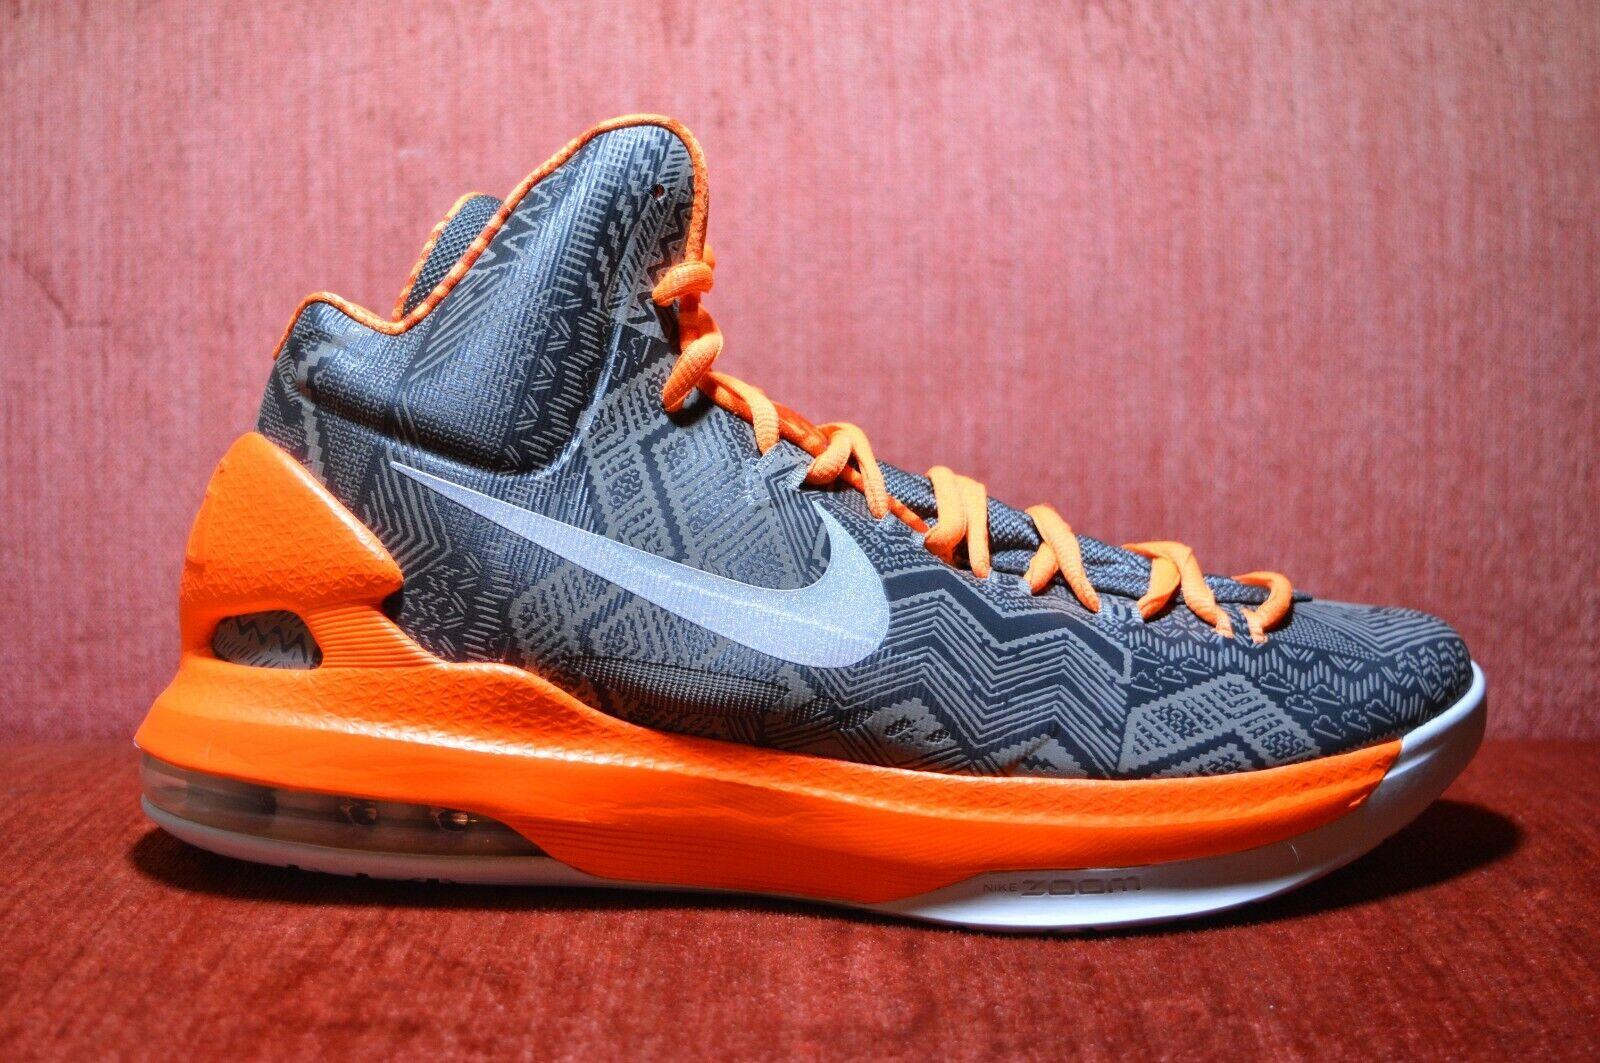 WORN ONCE Nike KD BHM Kevin Durant 5 583107-001 Size 10 Antracite Black orange